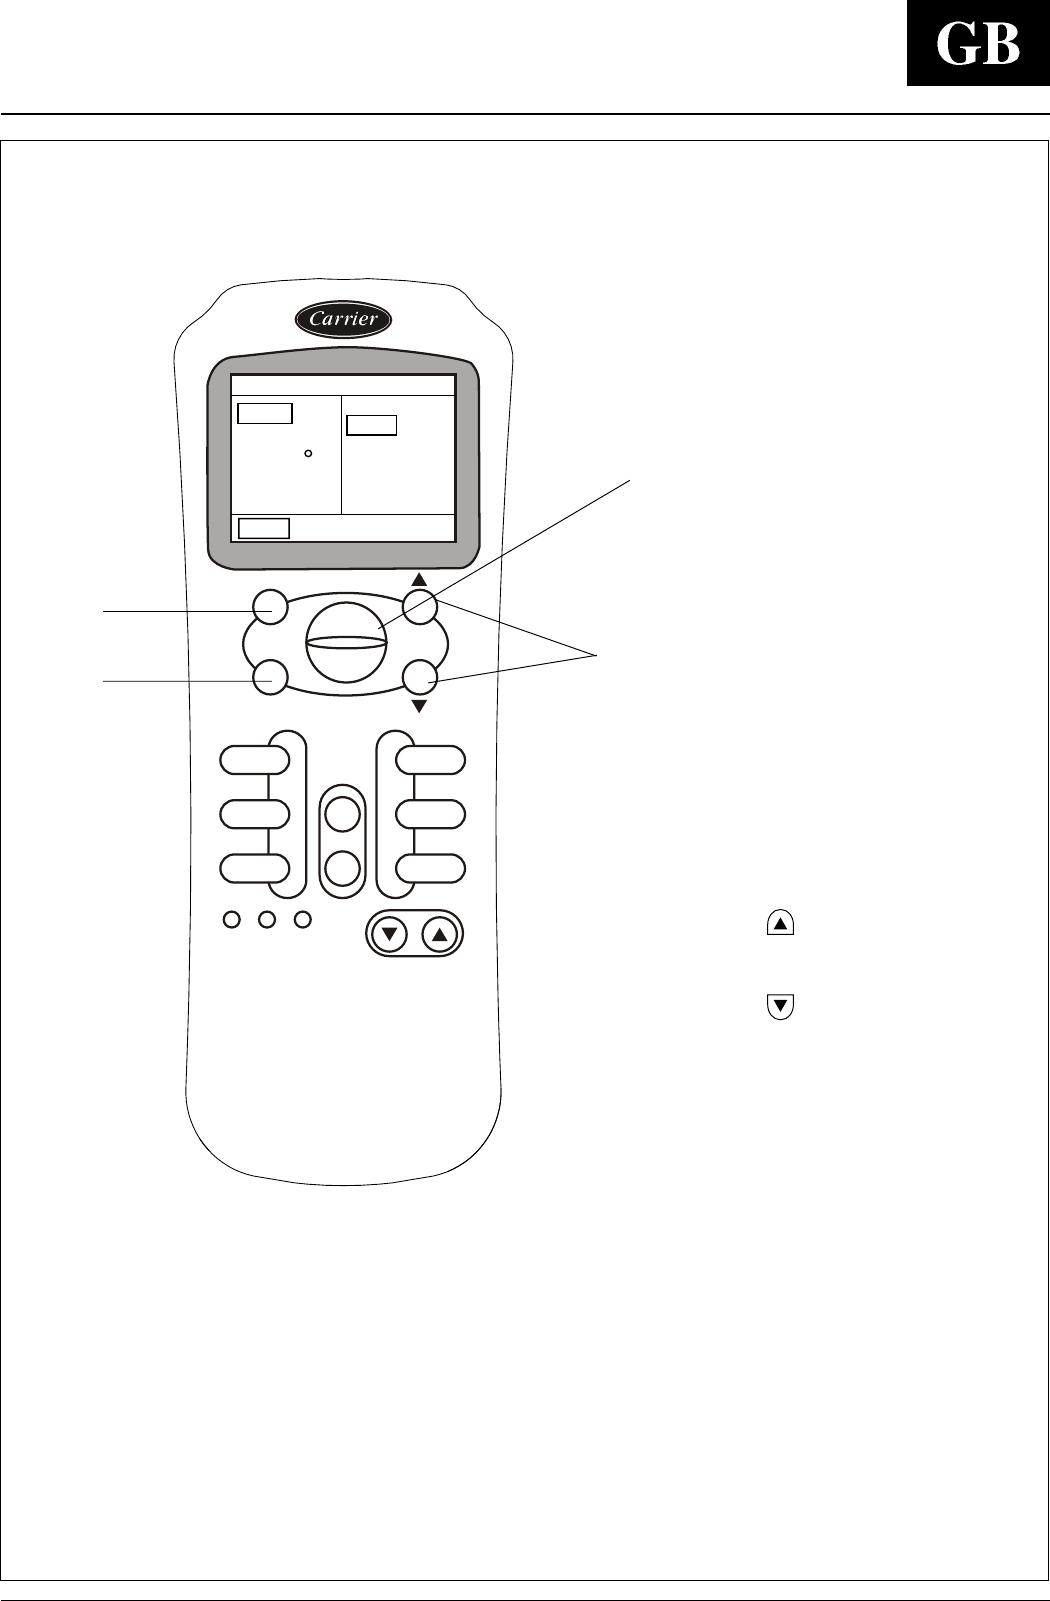 Handleiding Carrier 42hqe012 allegro plus (pagina 3 van 15) (English)